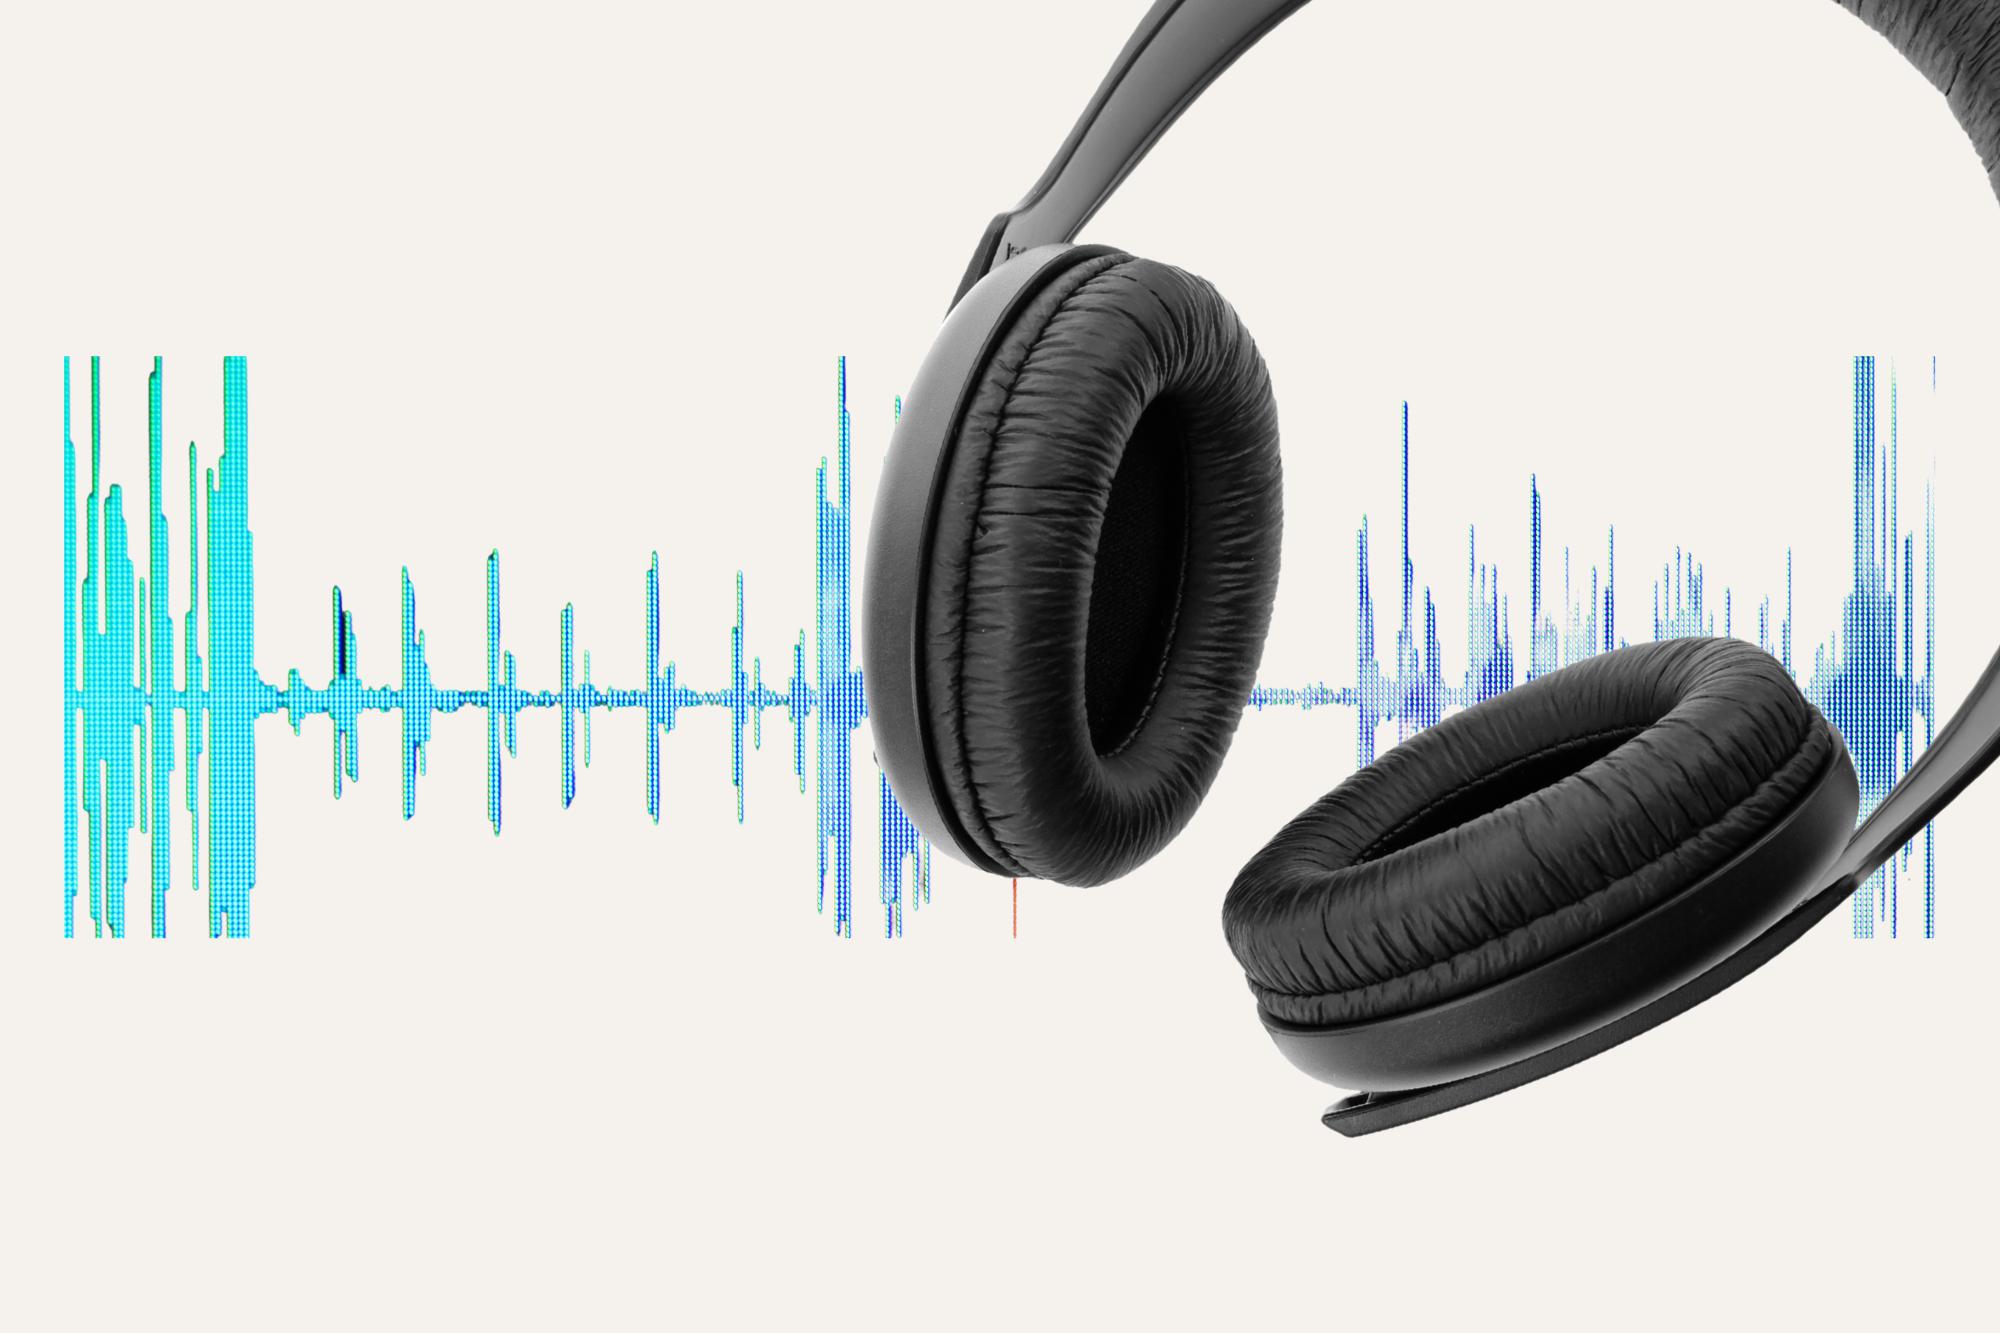 Entspannung per MP3. Audio mit Progressiver Muskelentspannung